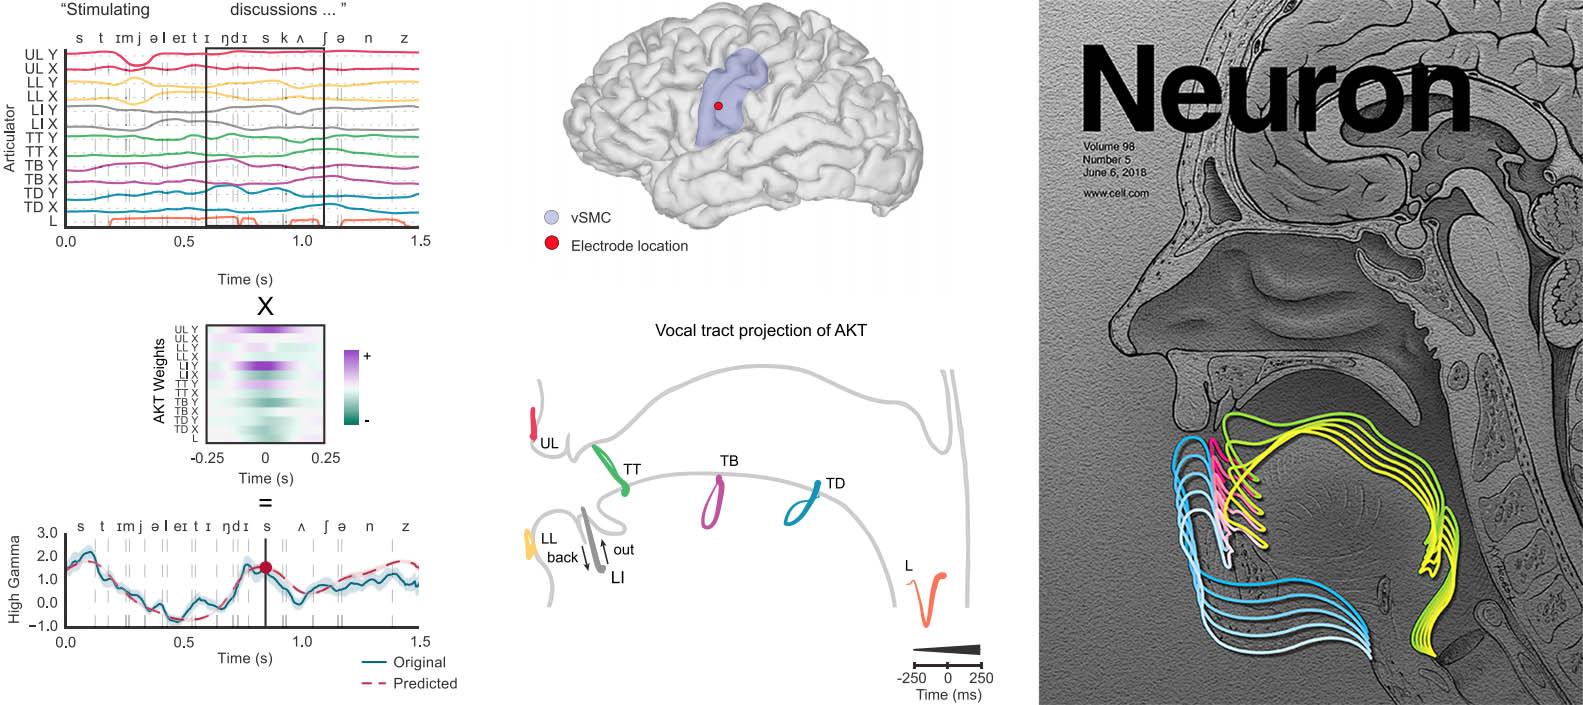 Chartier, J., Anumanchipalli, G.K., Johnson, K., & Chang, E.F. (2018).  Encoding of Articulatory Kinematic Trajectories in Human Speech Sensorimotor Cortex.  Neuron , 98(5): 1042-1054. doi:10.1016/j.neuron.2018.04.031.